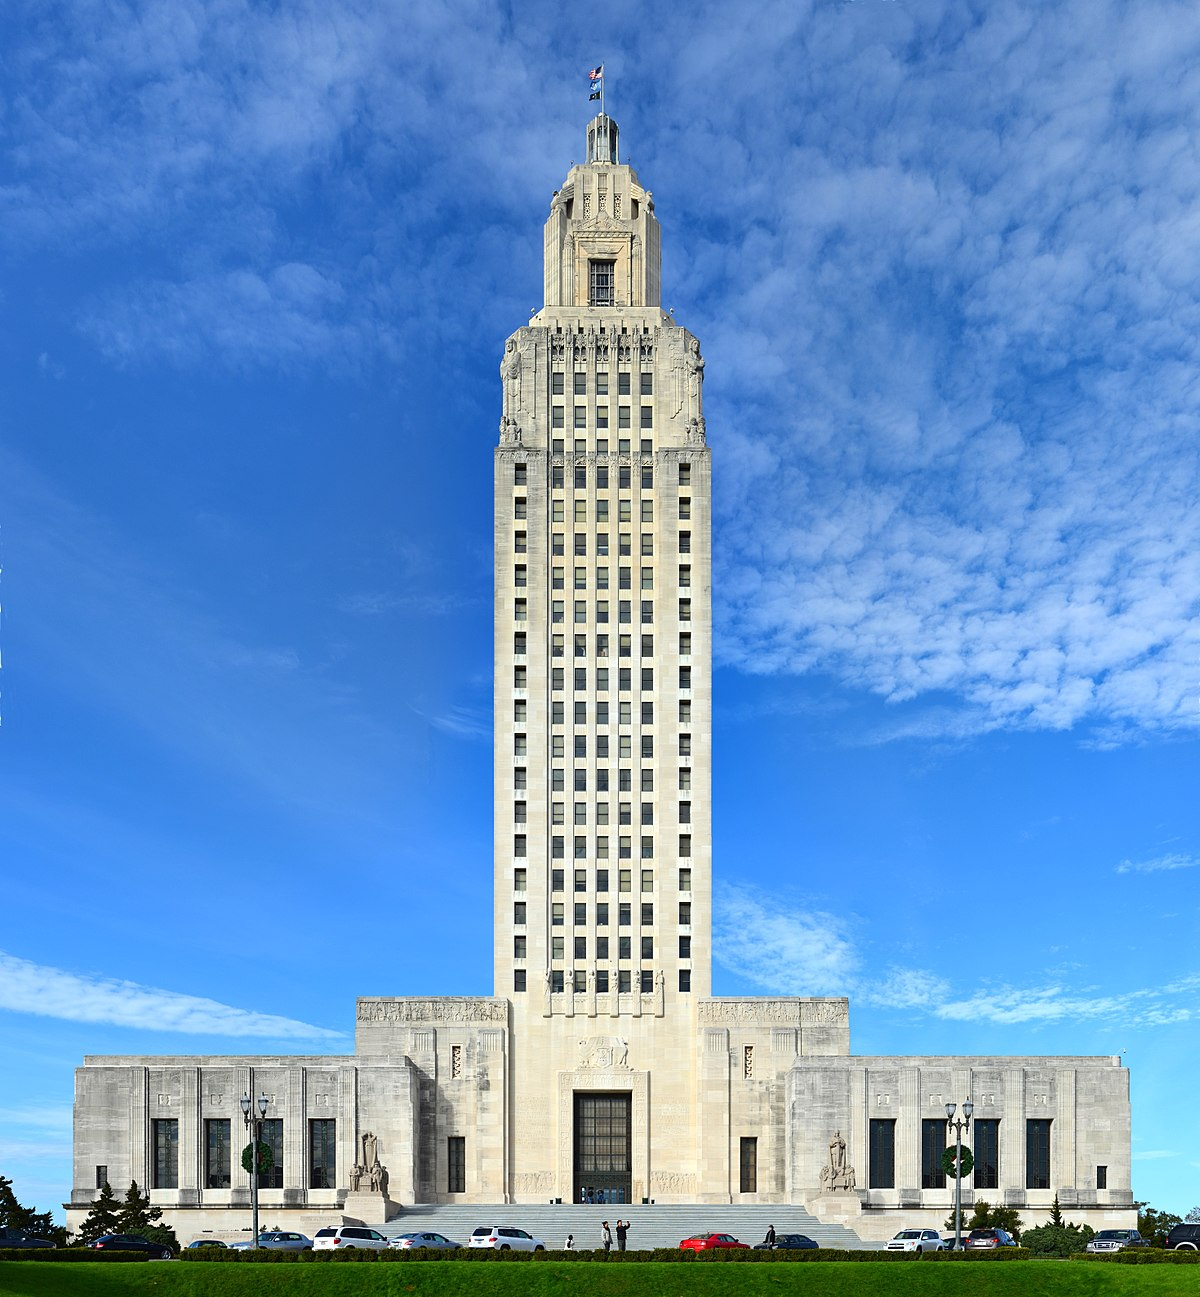 Louisiana_State_Capitol_Building_1527634263017.jpg